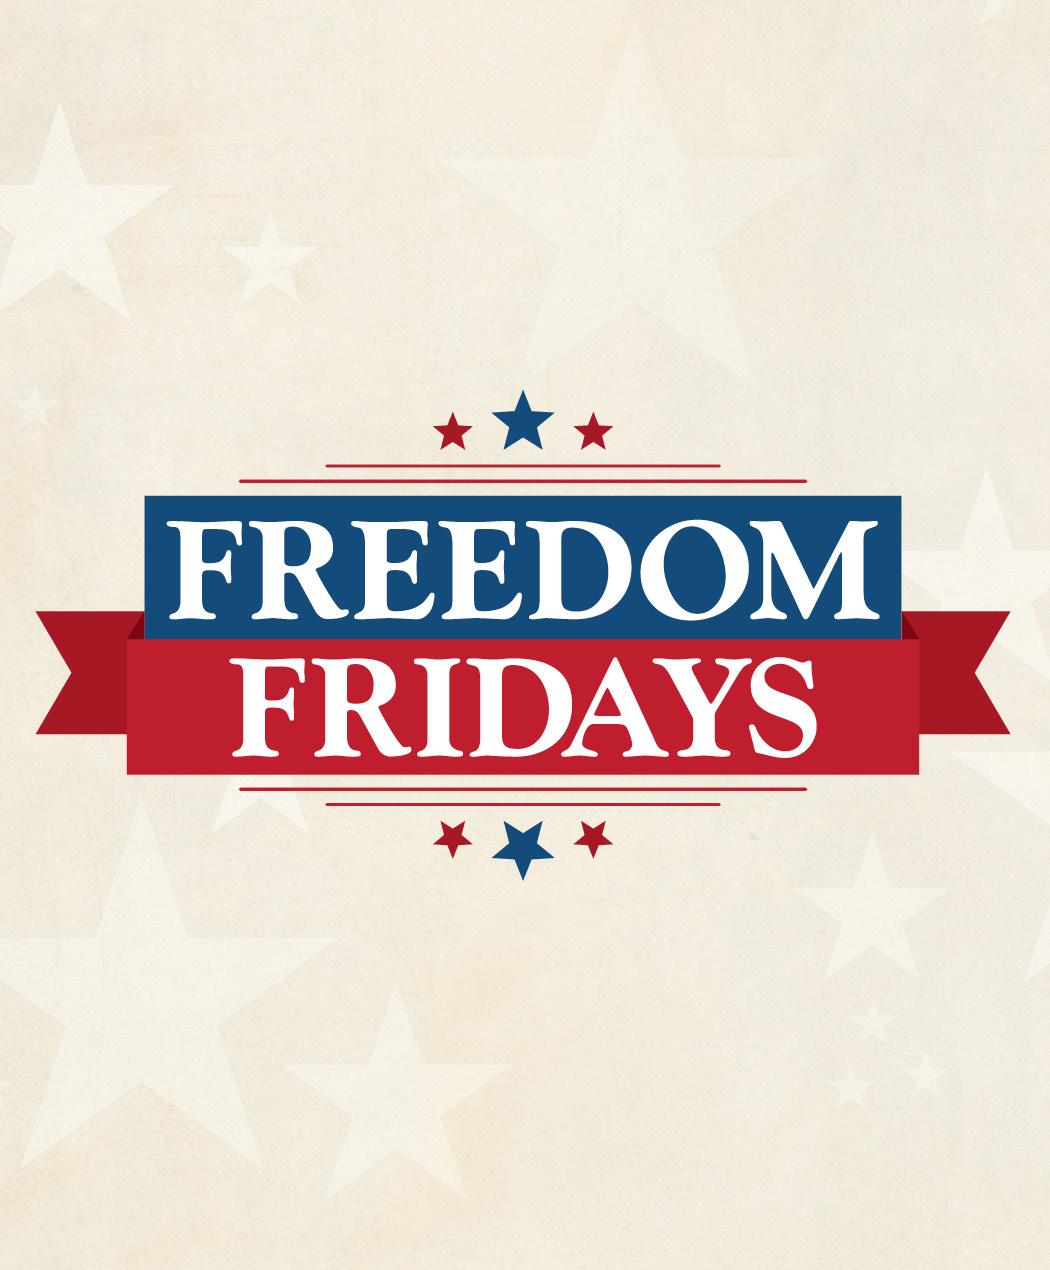 Freedom Fridays